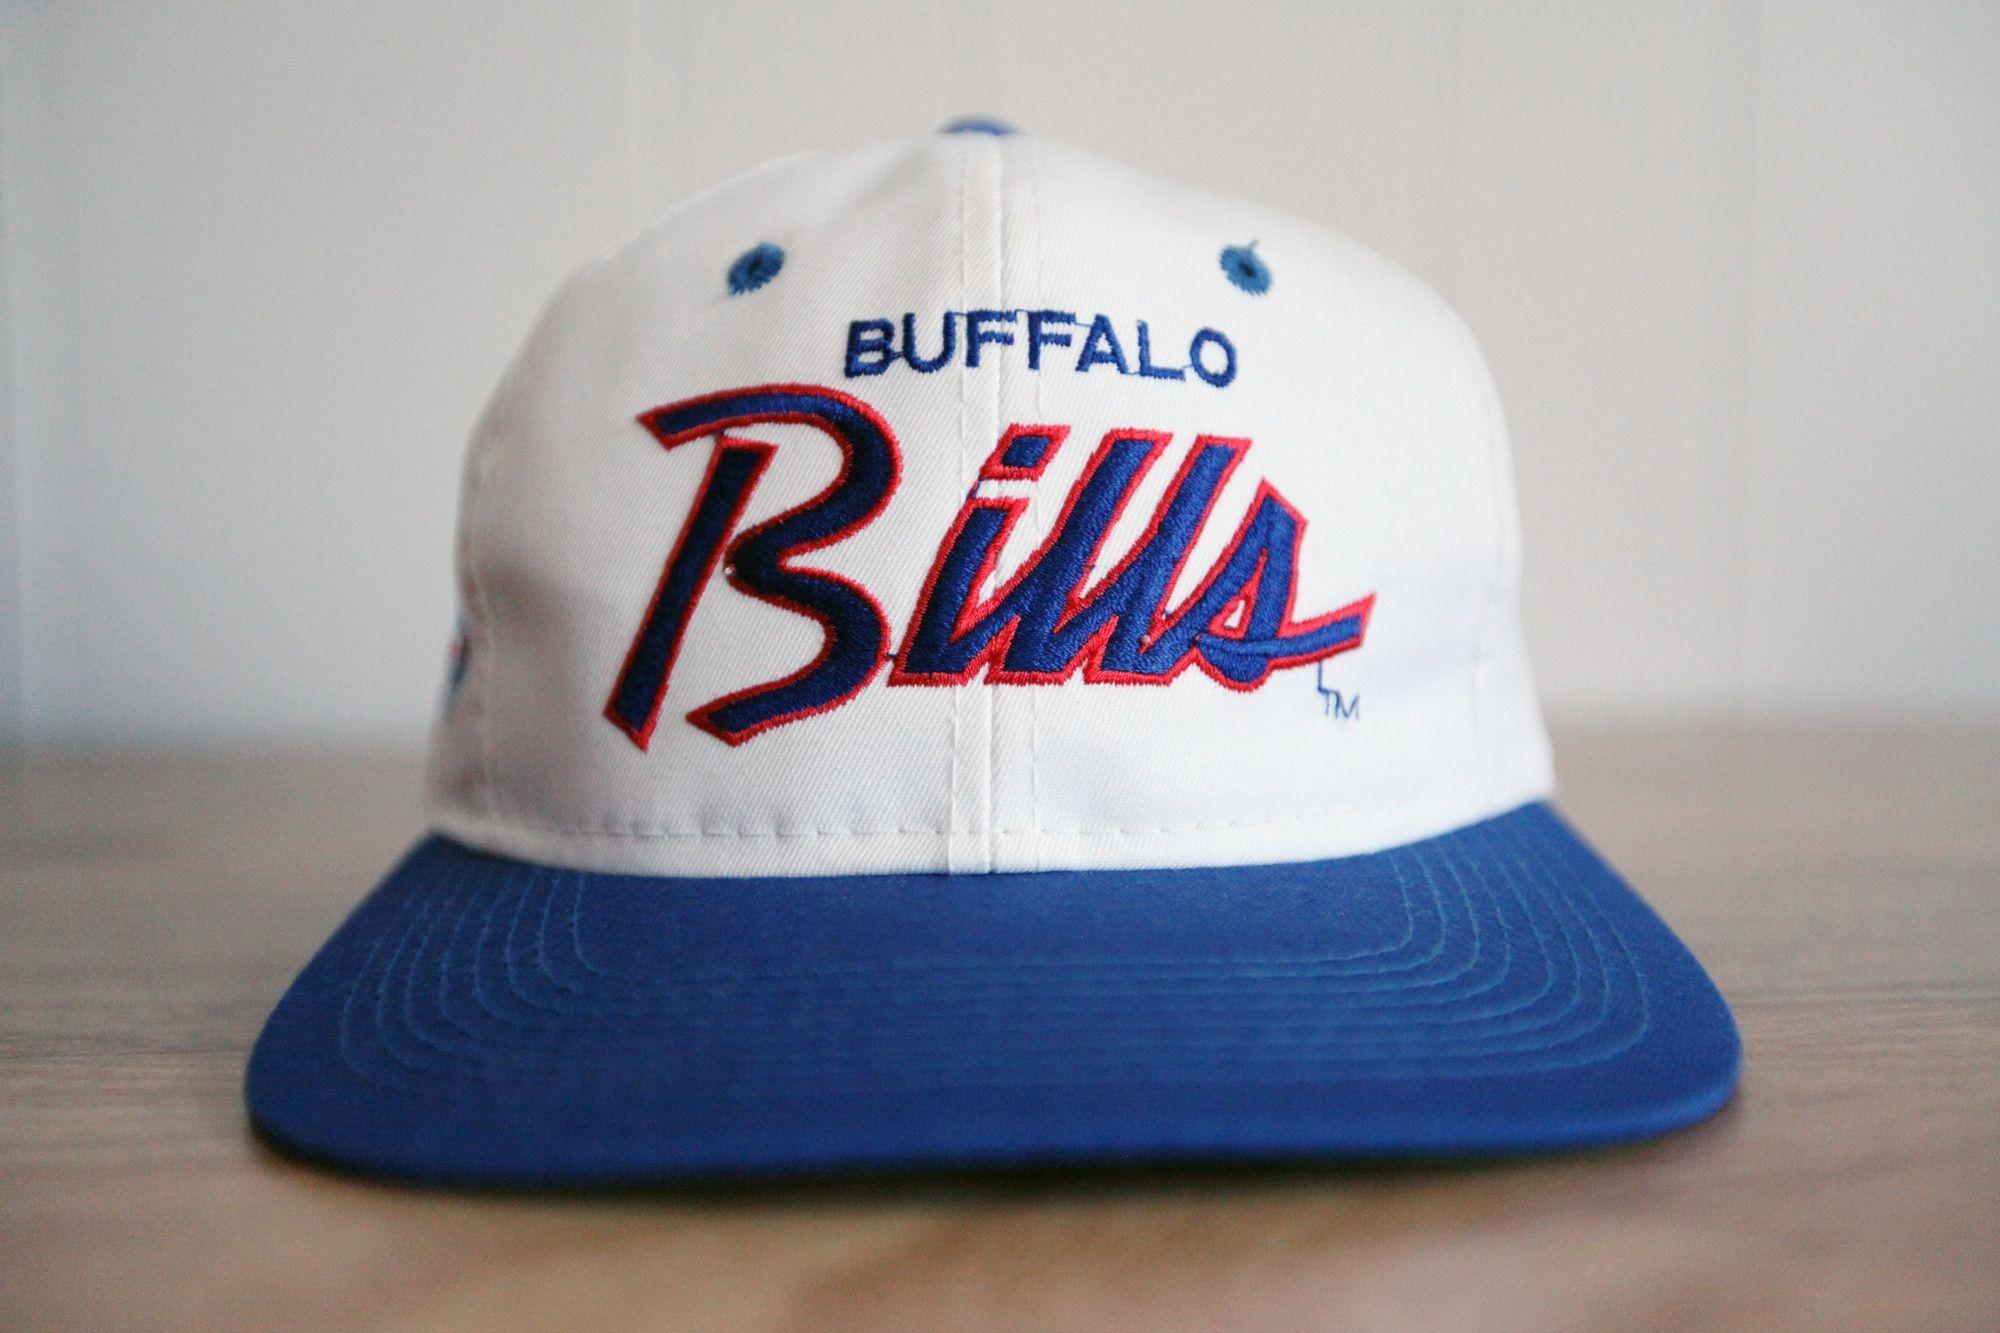 48970bc90e302 ... purchase vintage 90s buffalo bills sports specialties script the twill  white dome snapback hat 428eb 4bc98